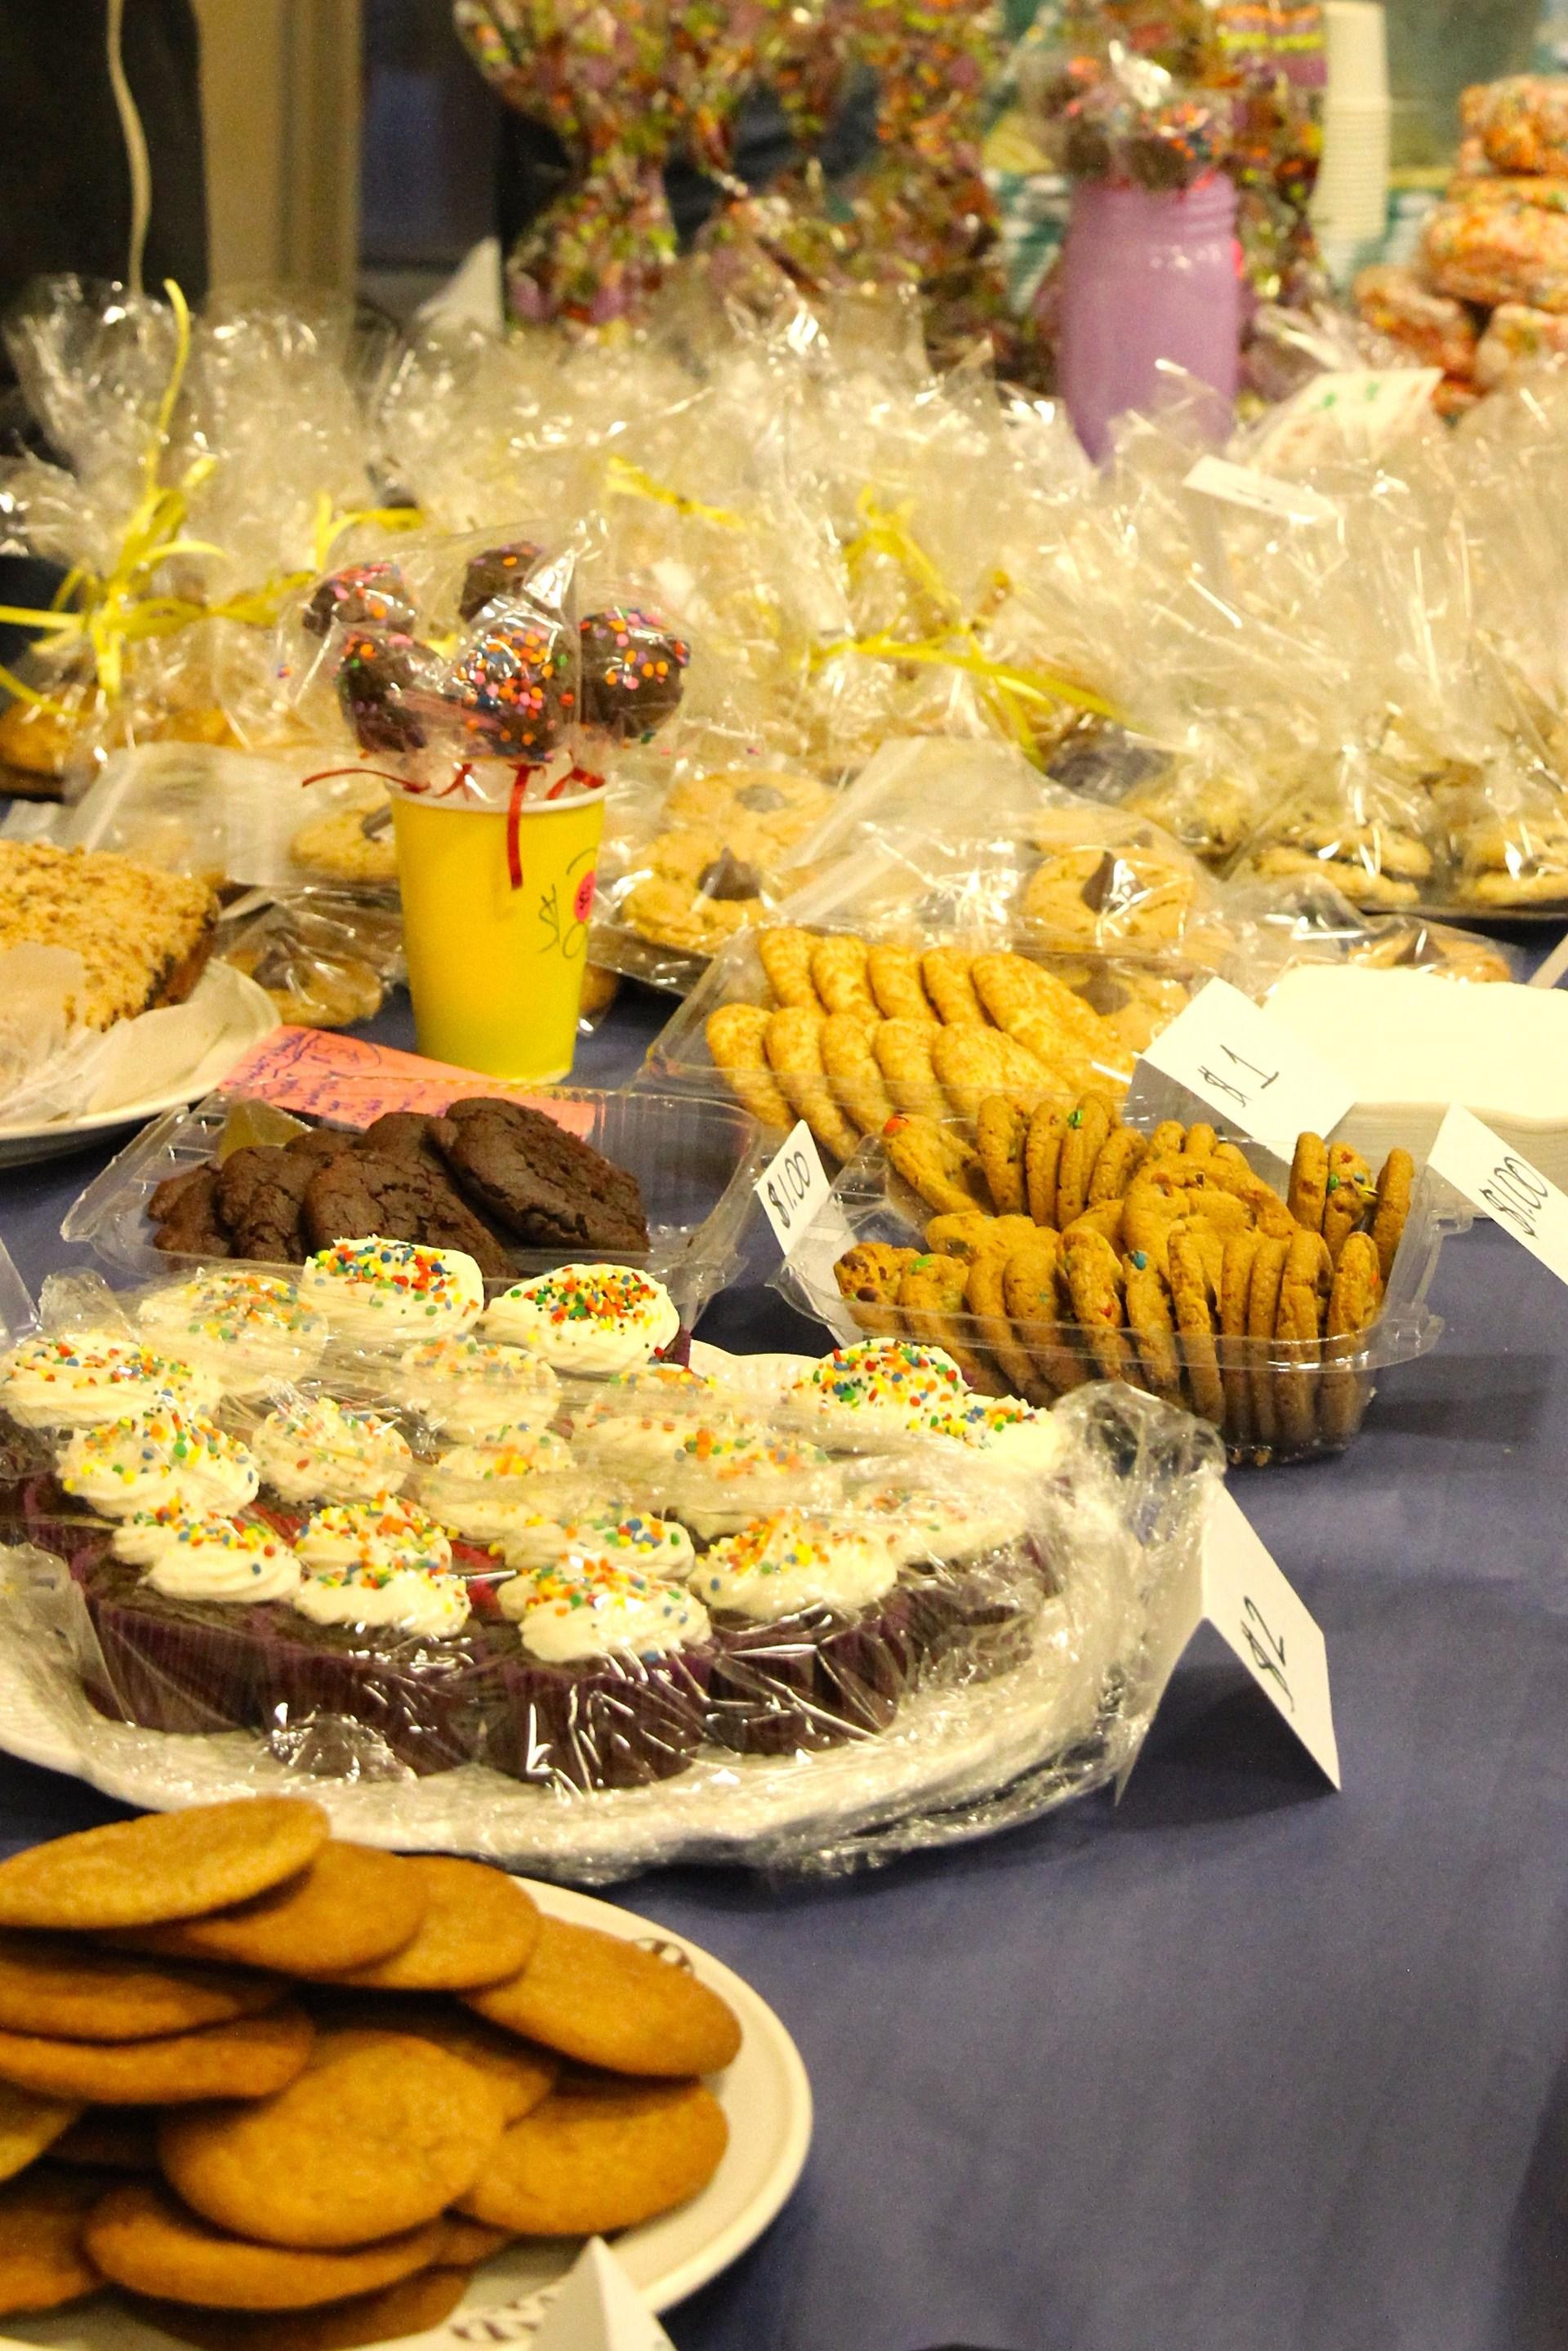 Bake sale goodies